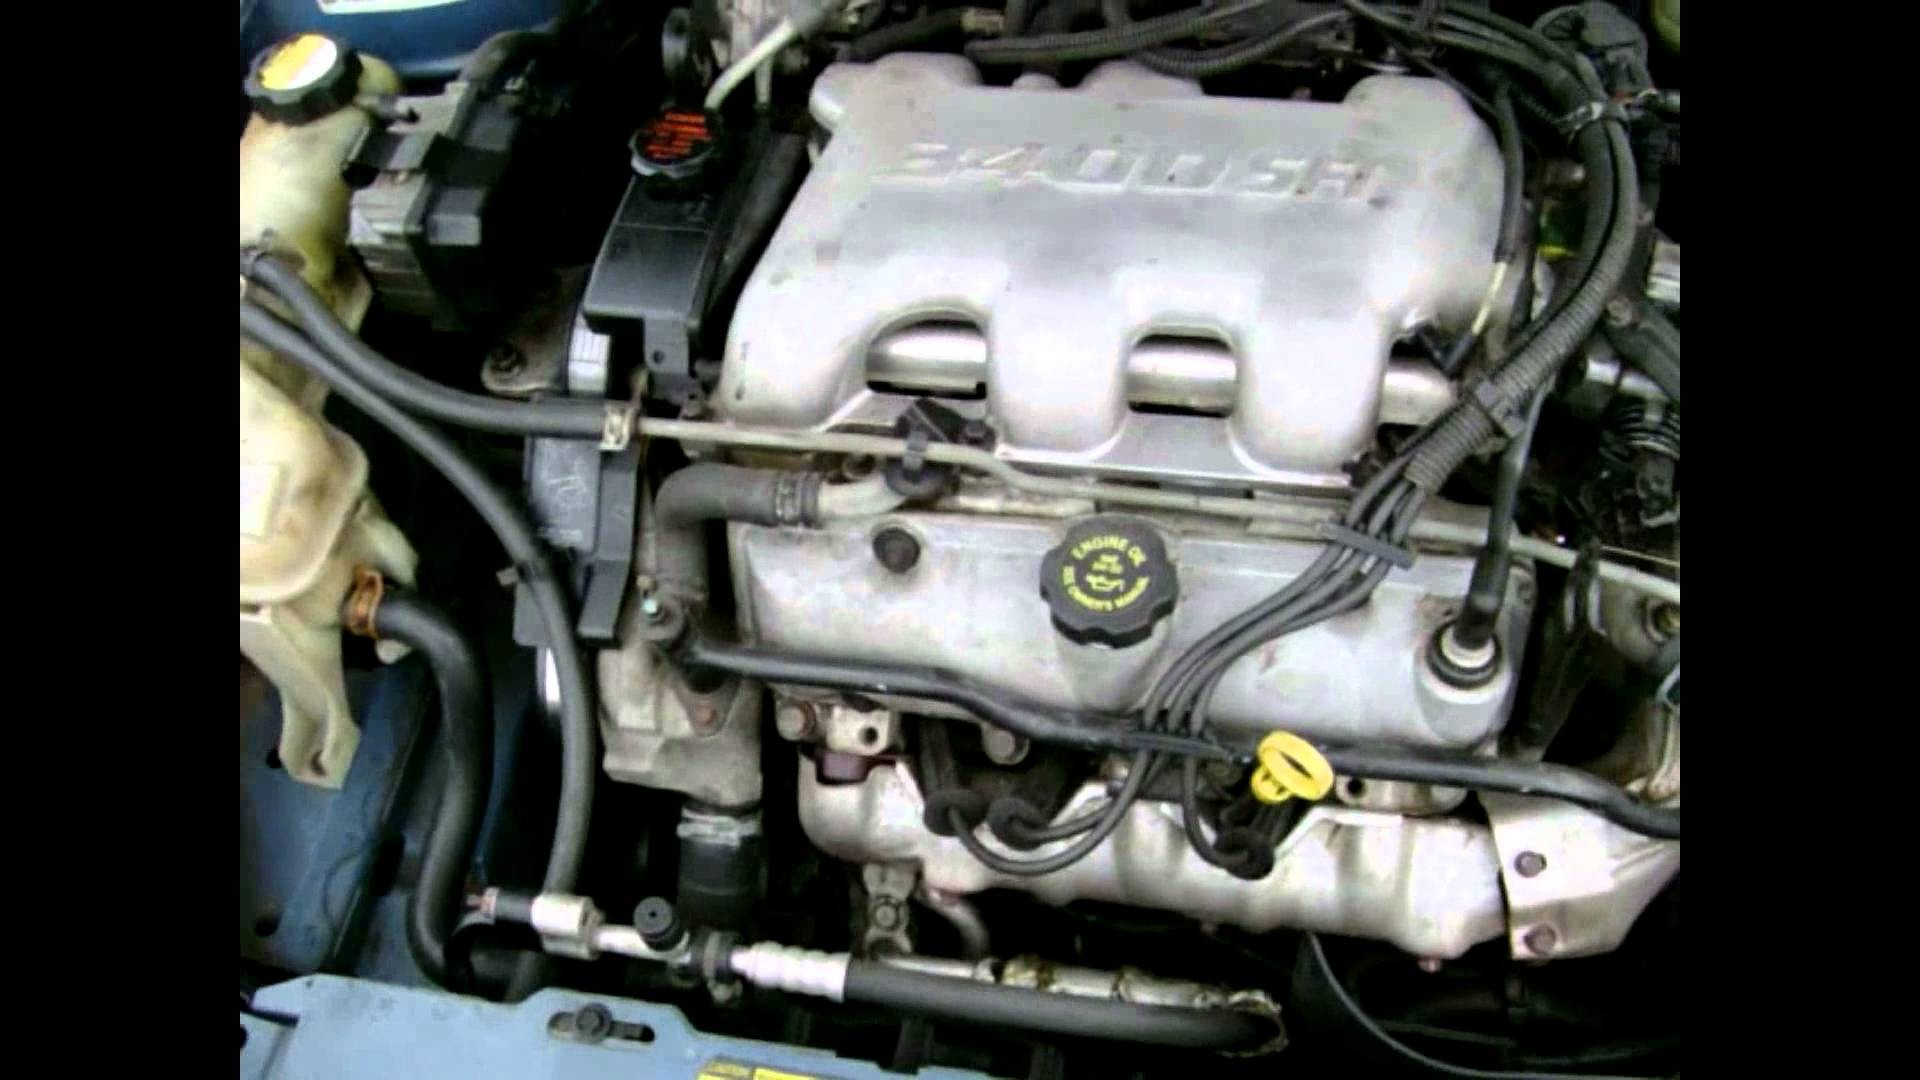 [TVPR_3874]  TB_0643] Gm 3 4L Engine Diagram Schematic Wiring | Gm 3 4l Engine Diagram |  | Seve Chro Carn Emba Mohammedshrine Librar Wiring 101